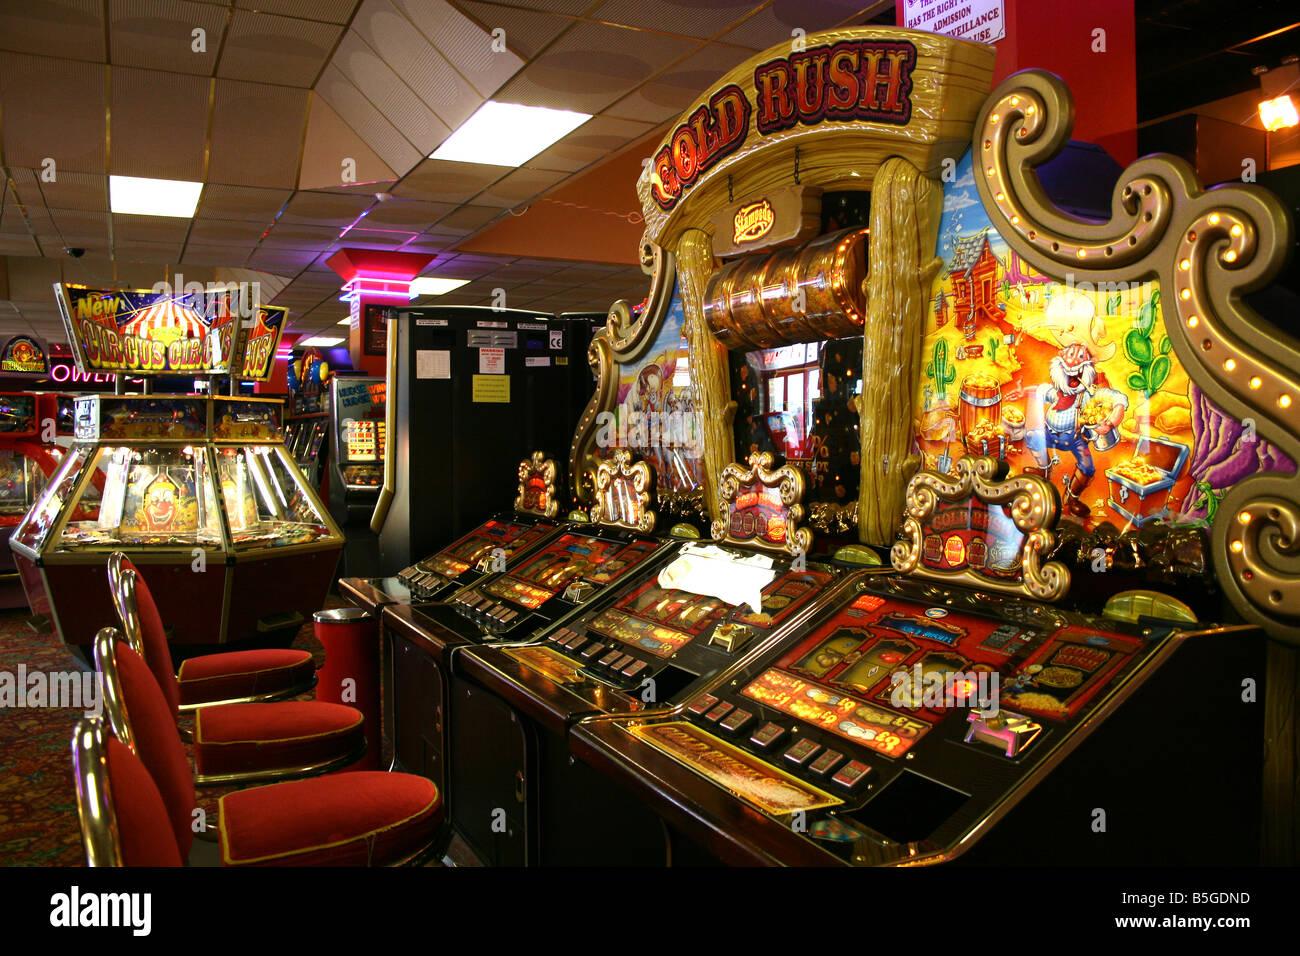 Dungeons and dragons video slot machine juegos gratis de poker texas